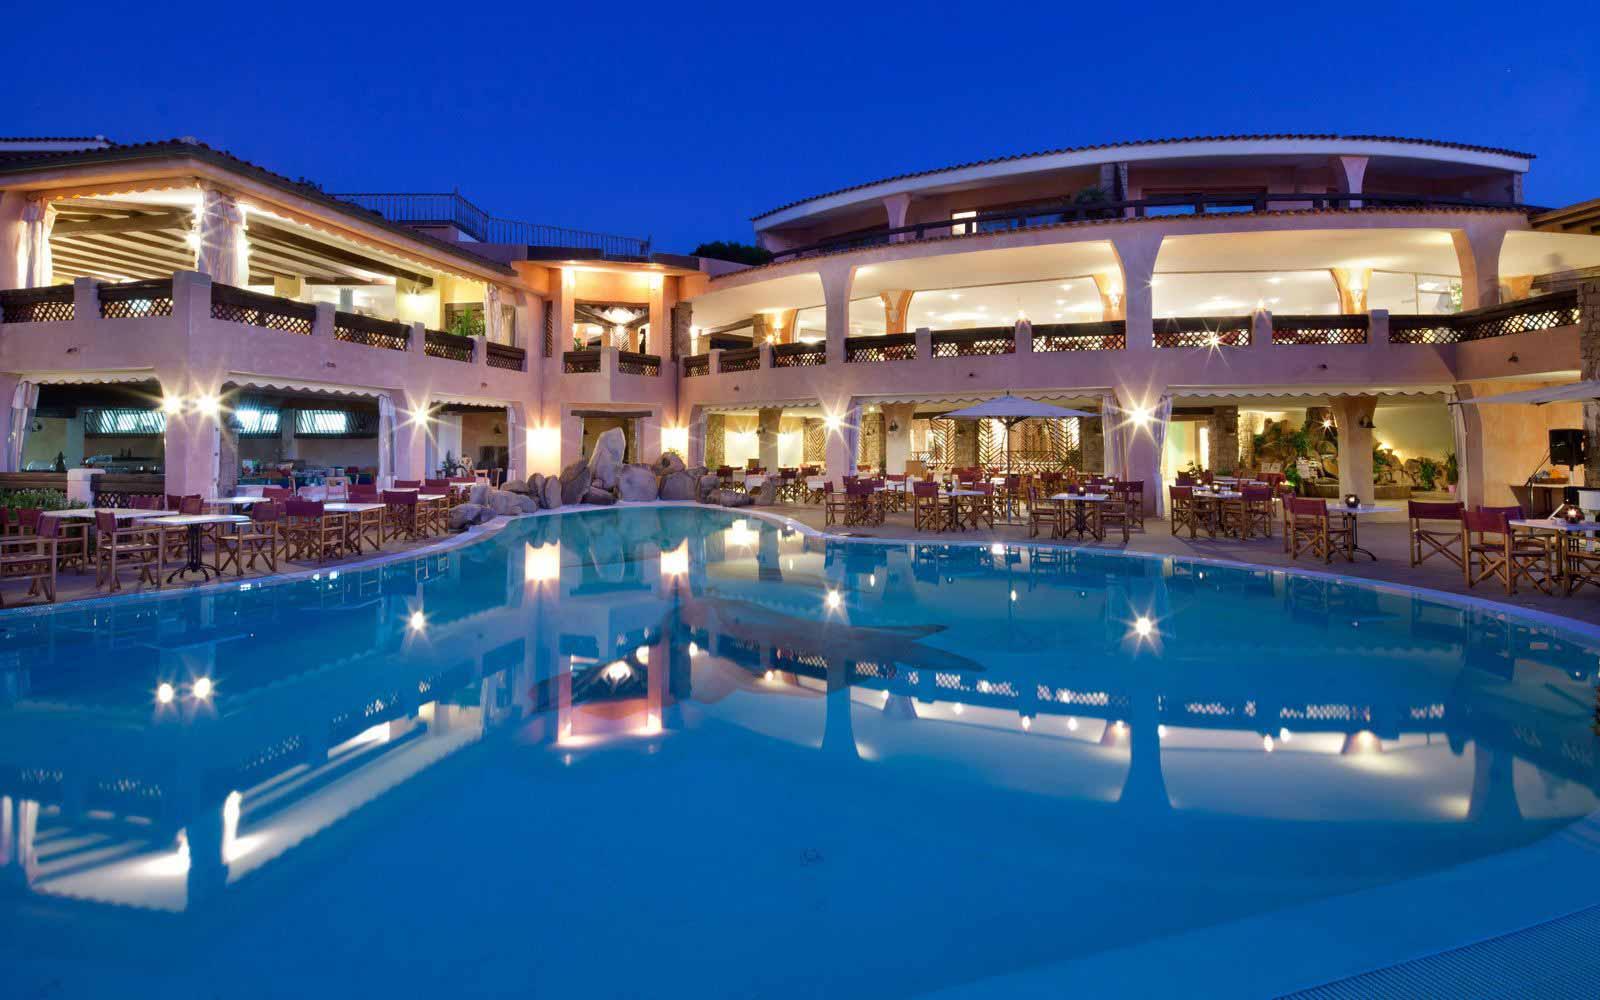 Night view of Hotel Marinedda Thalasso & Spa